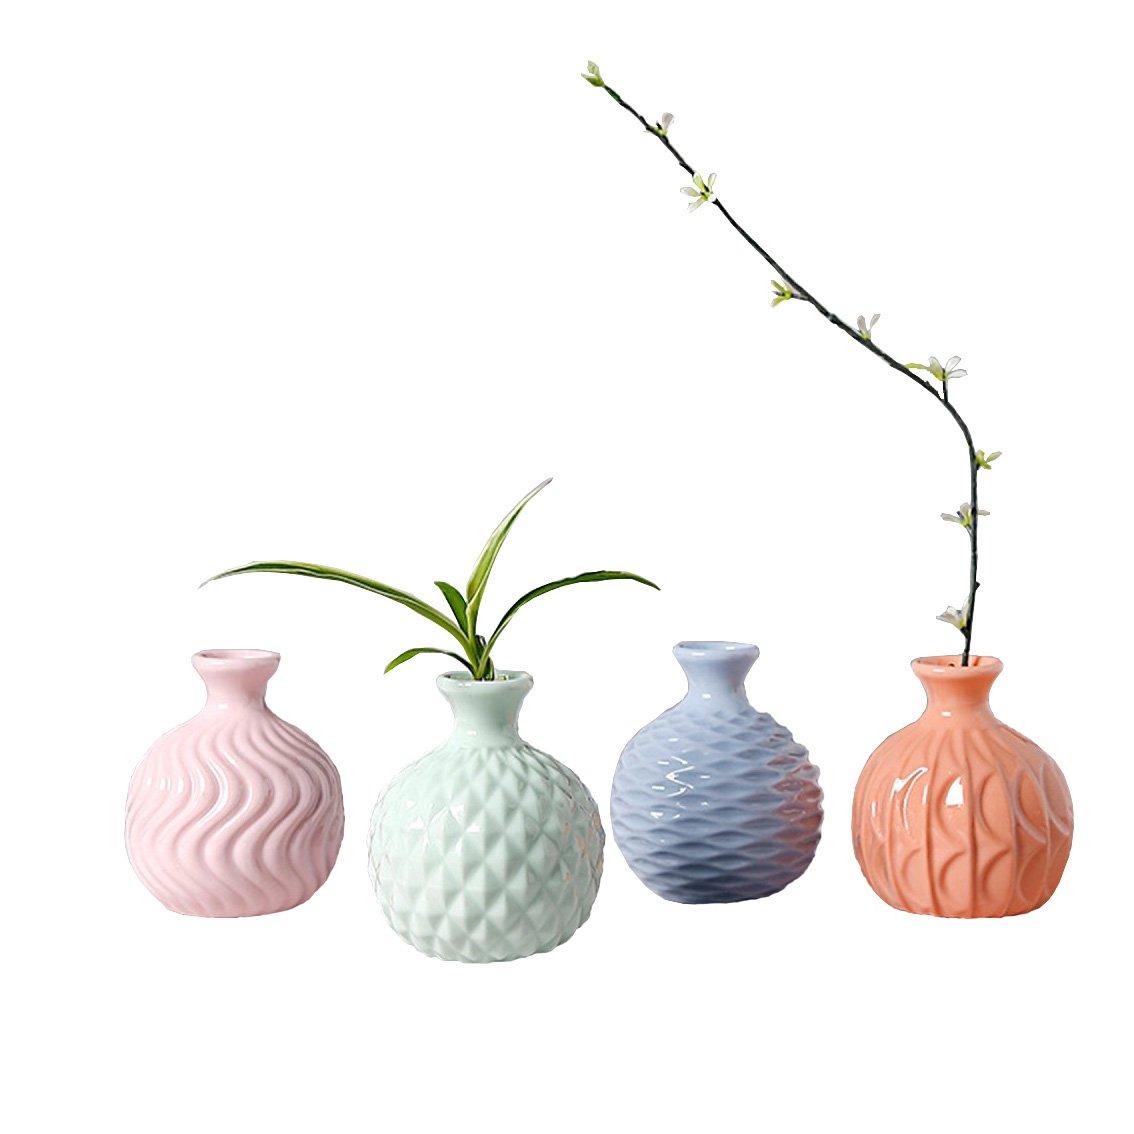 Youfui Ikebana Floral Vase Handmade Hydroponics Creative Flower Decoration, set of 4